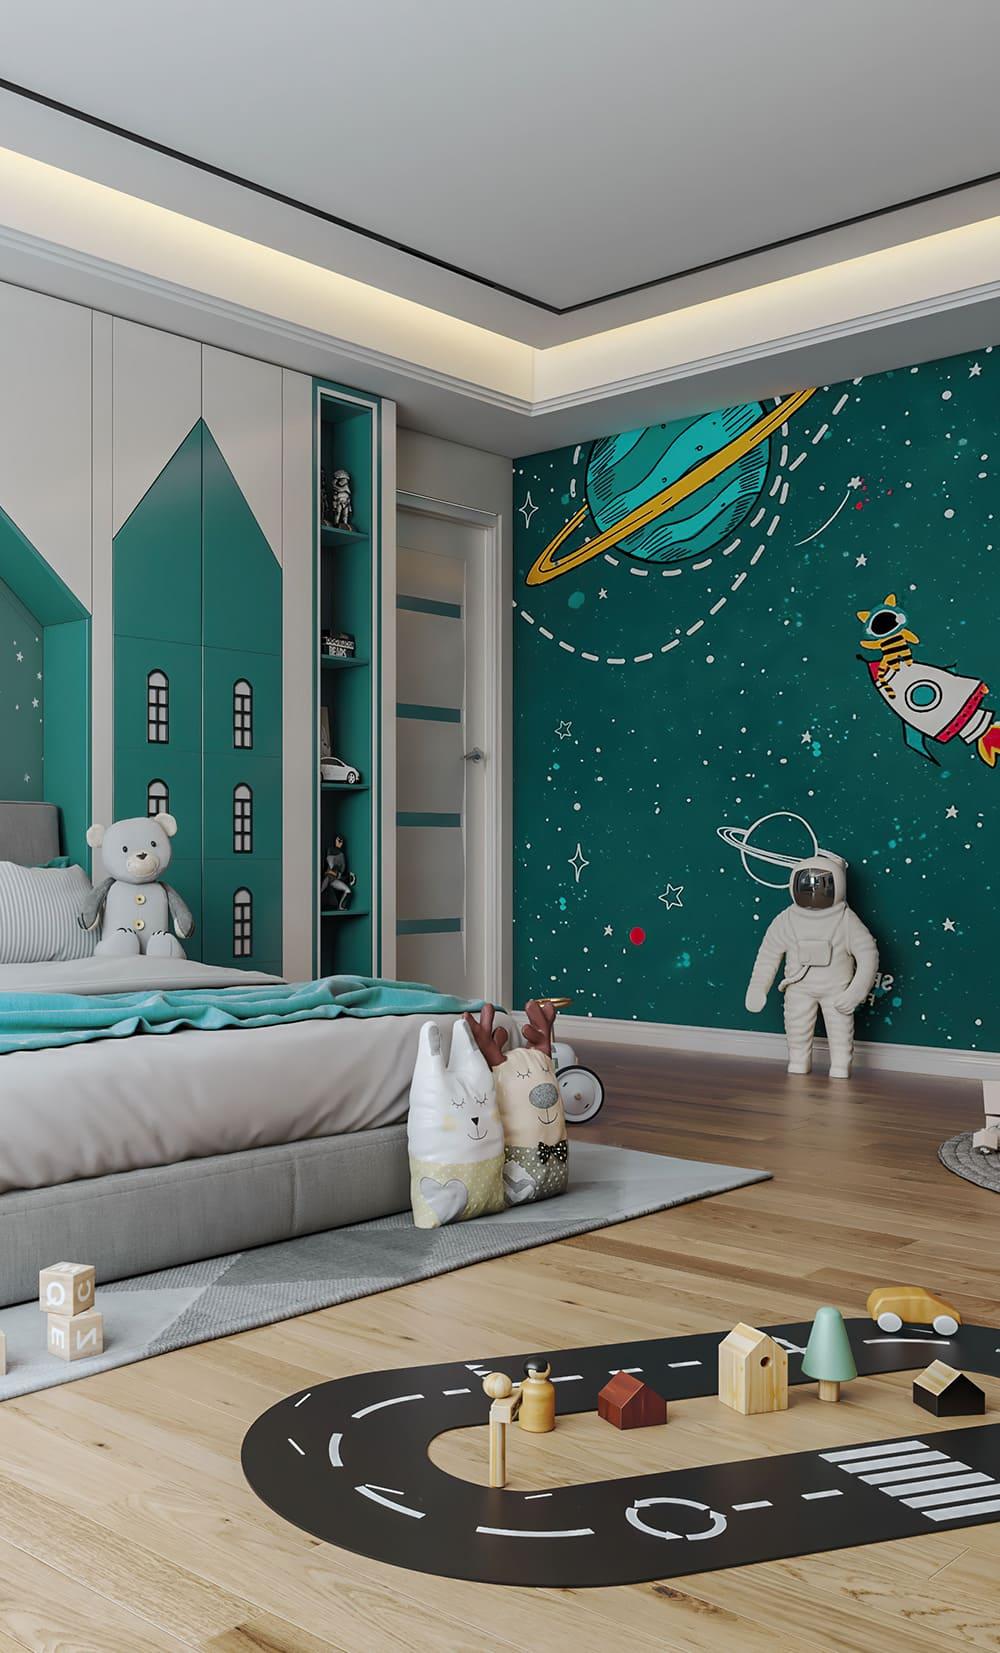 интерьер детской комнаты фото 43